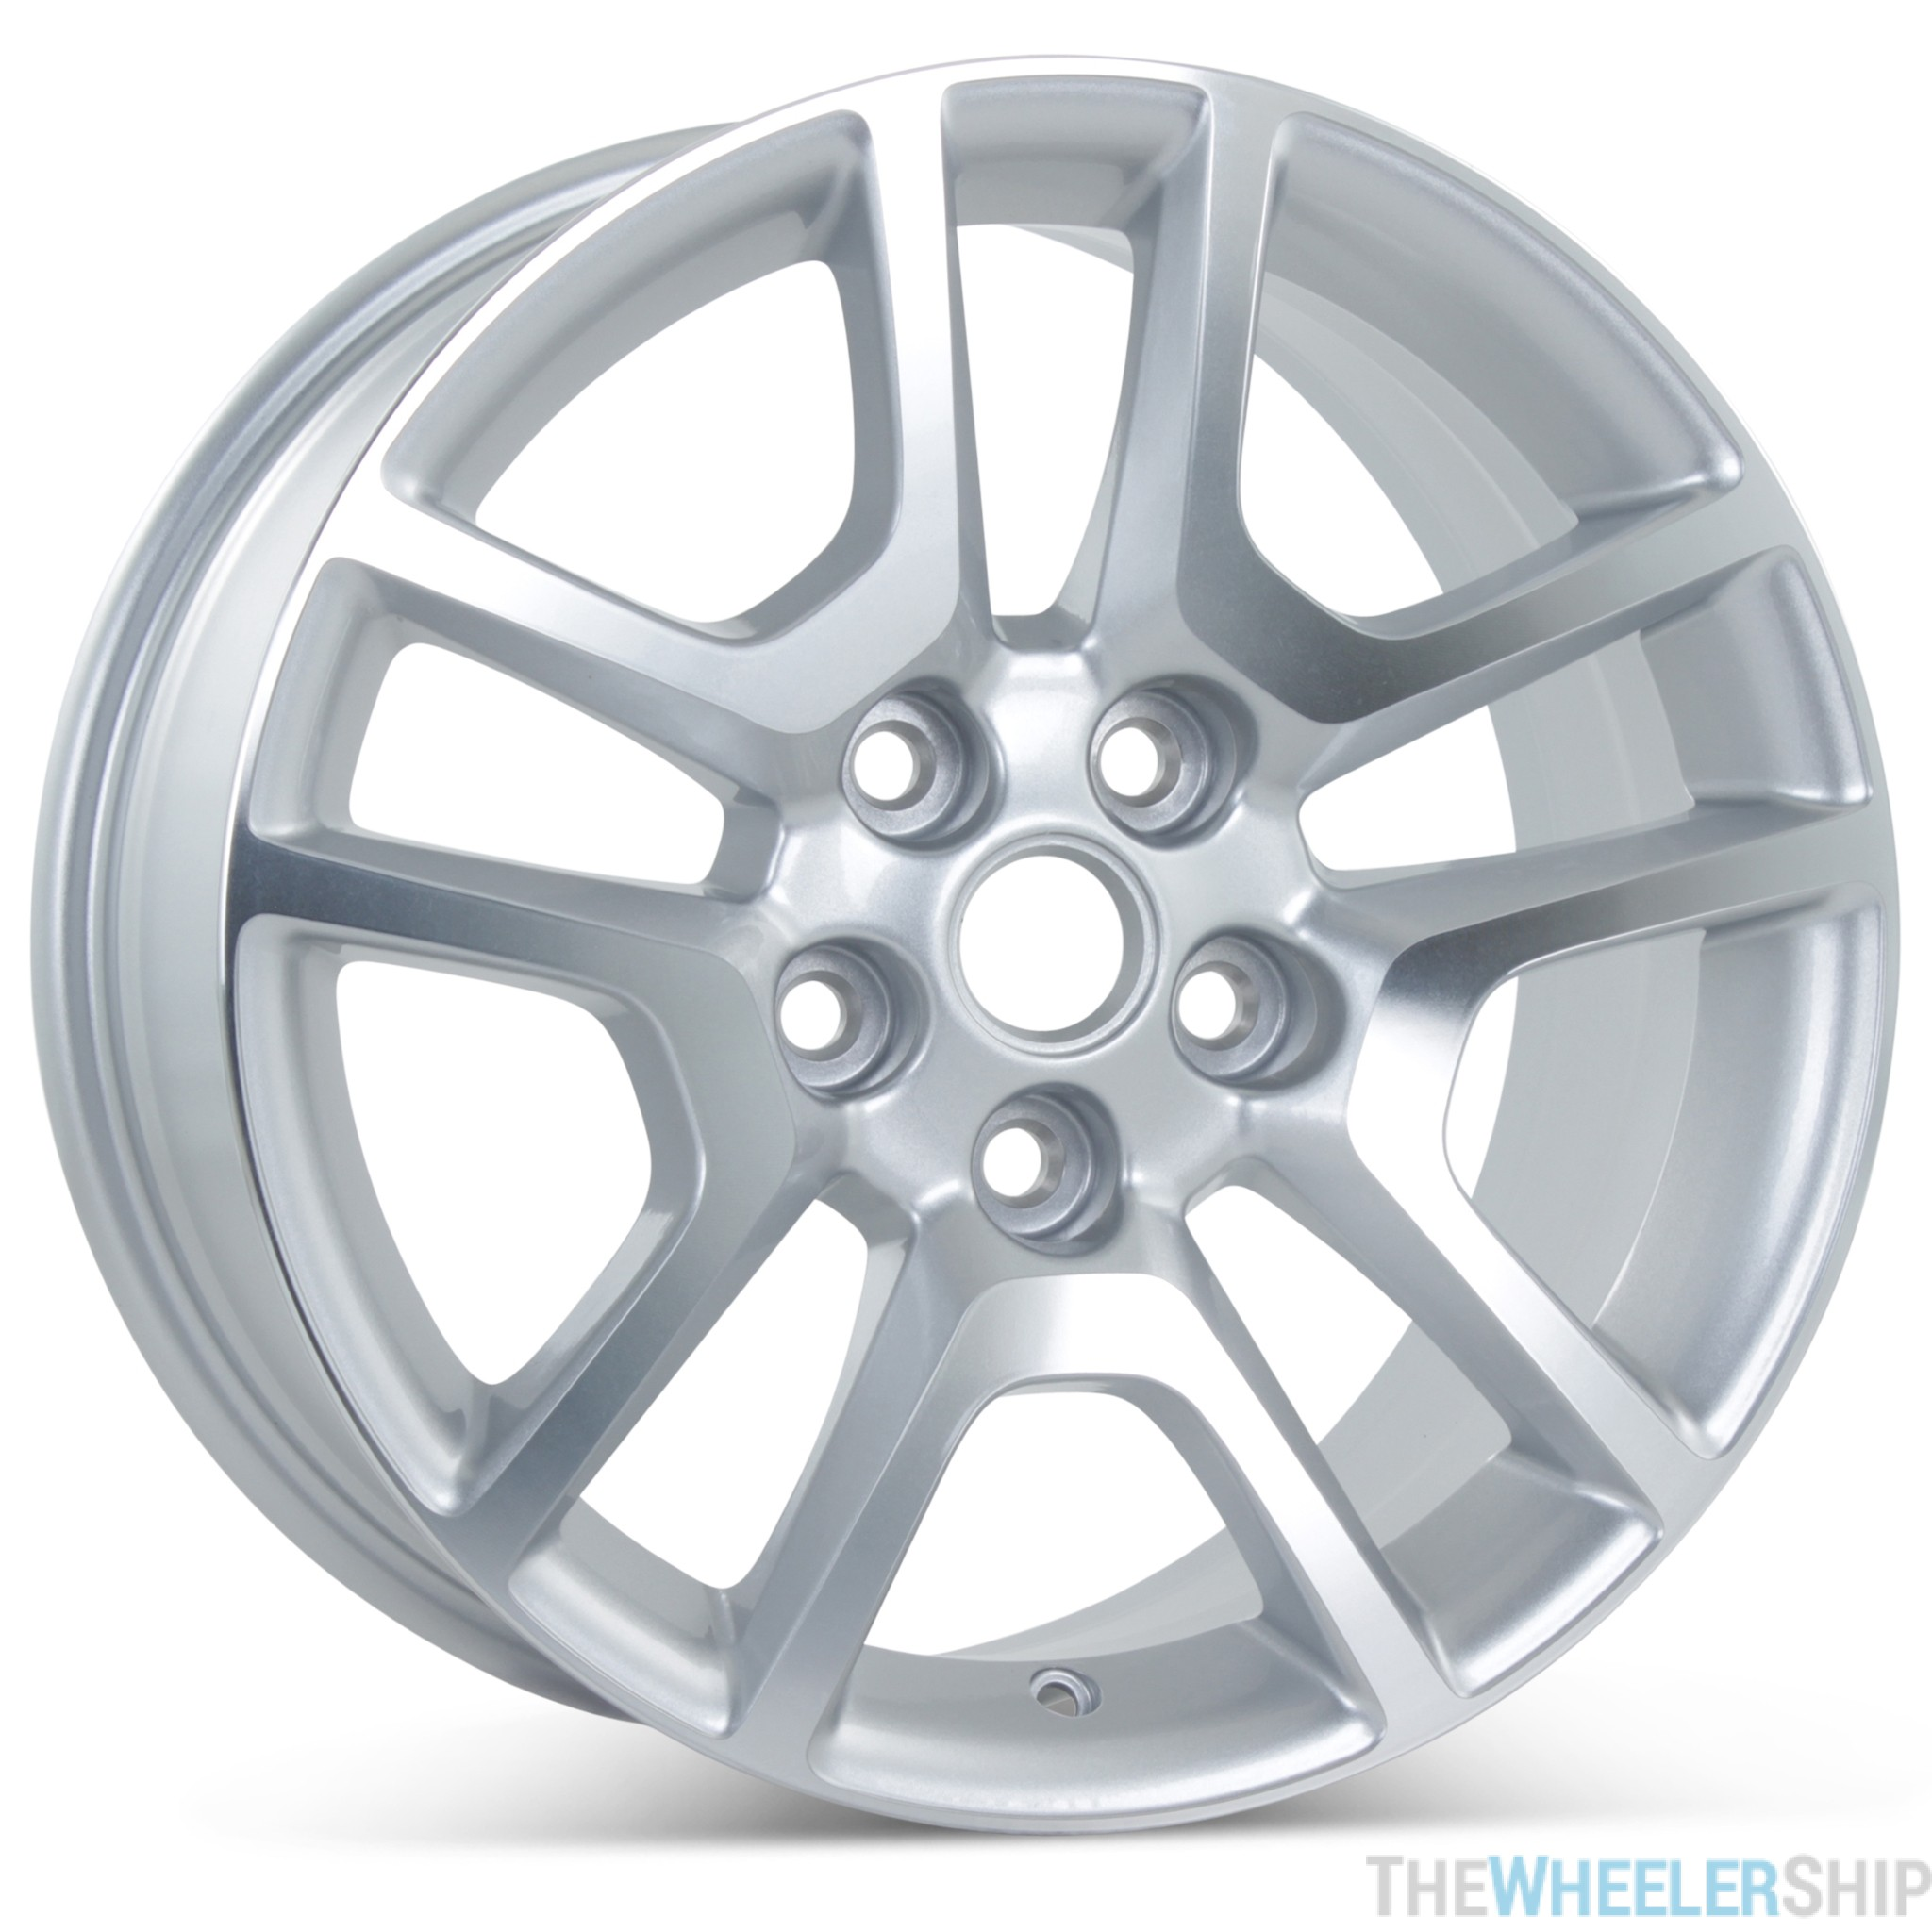 "New 17/"" Replacement Rim for Chevrolet Malibu 2013-2016 Wheel Silver"